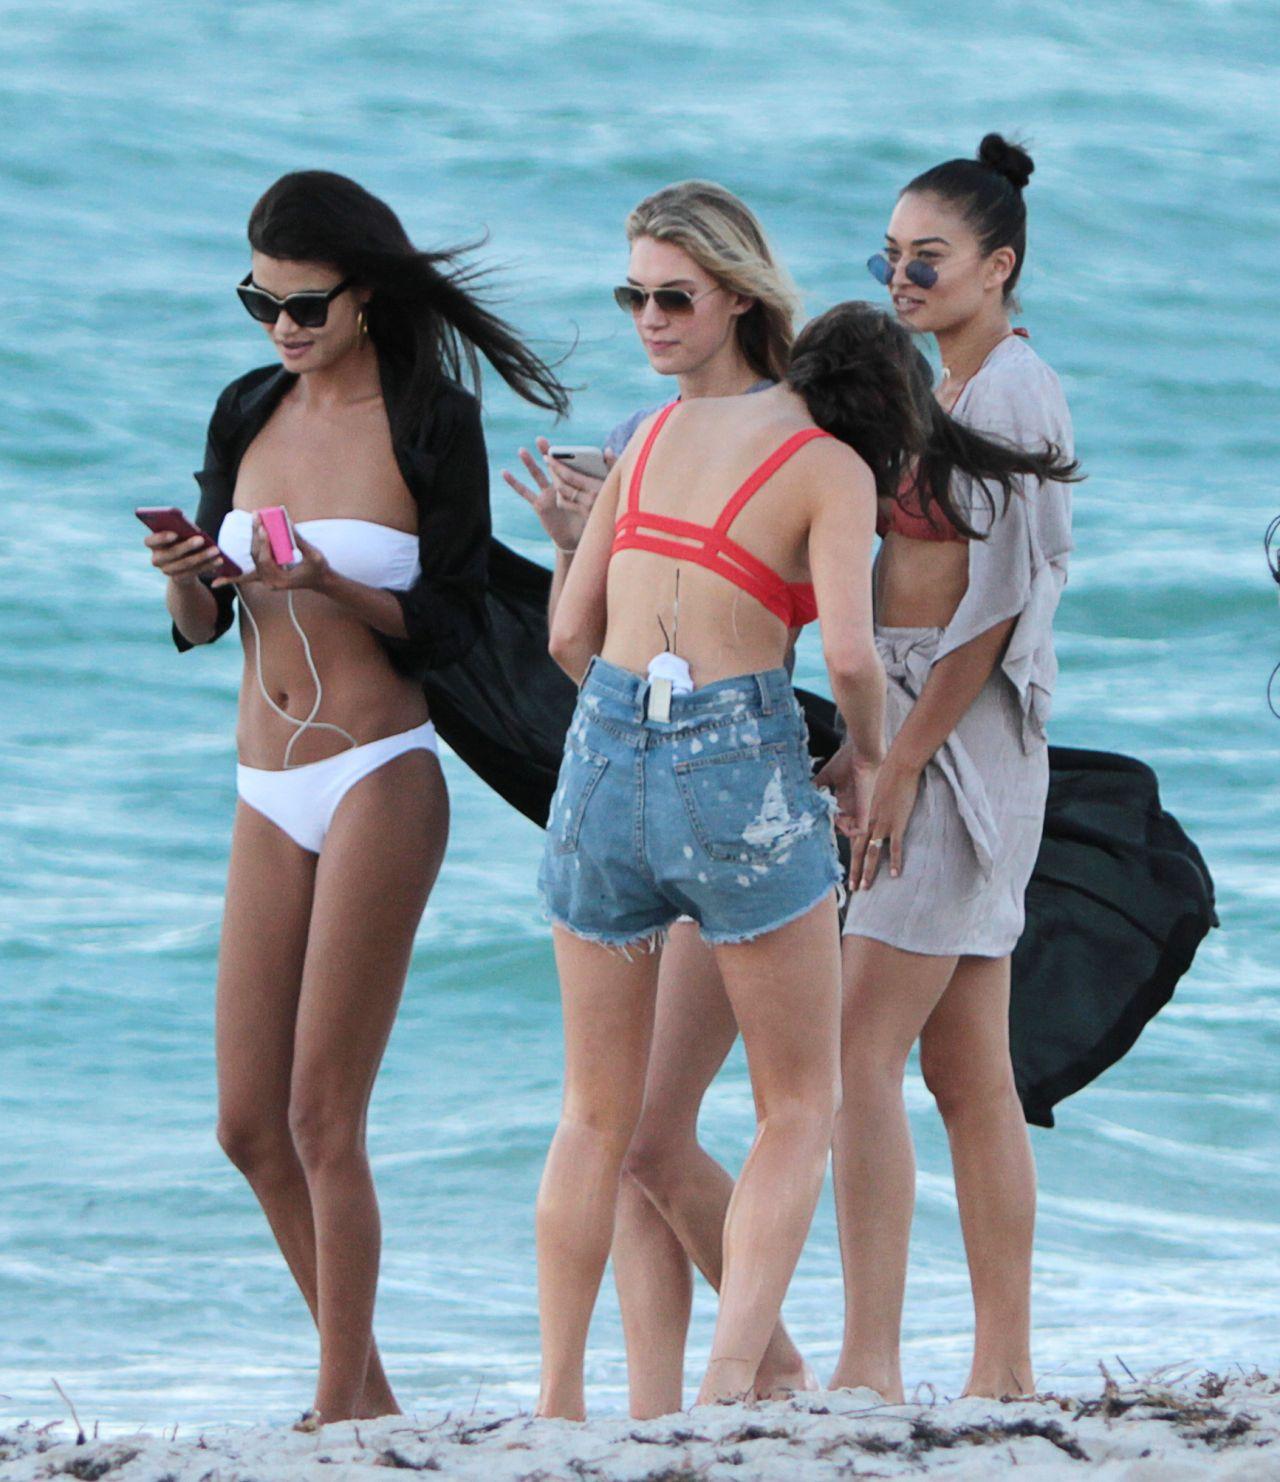 Bikini Daniela Braga nude (82 foto and video), Pussy, Bikini, Selfie, cameltoe 2019